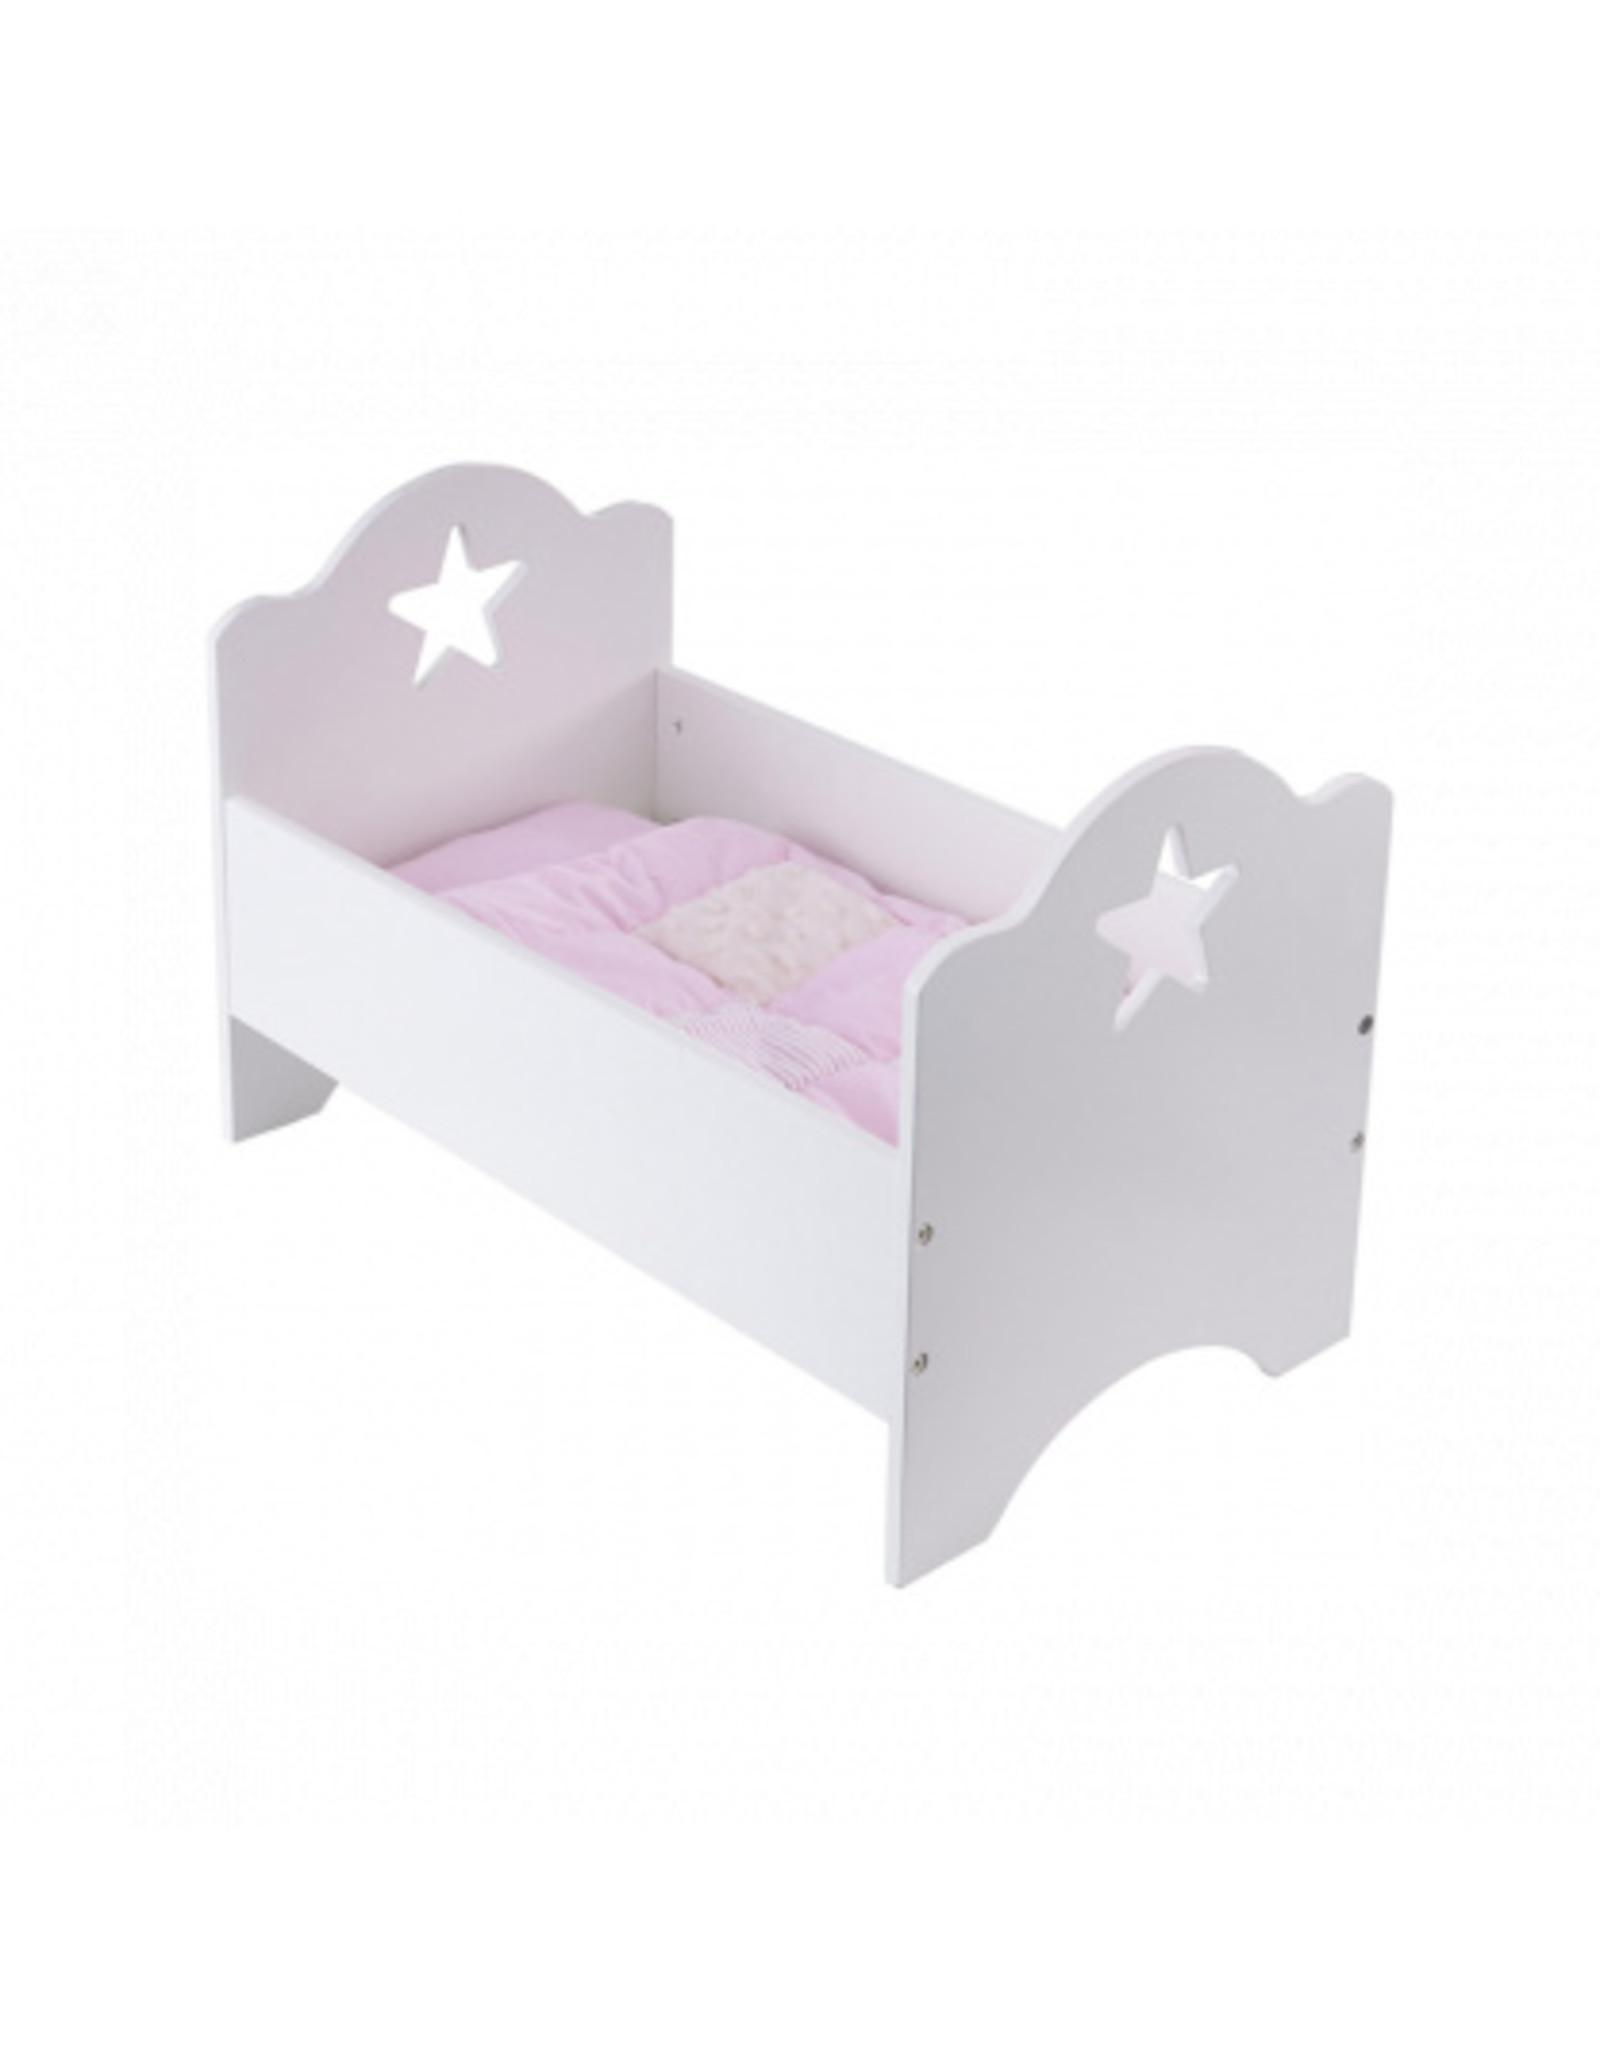 KIDS CONCEPT White Star Dolls Bed